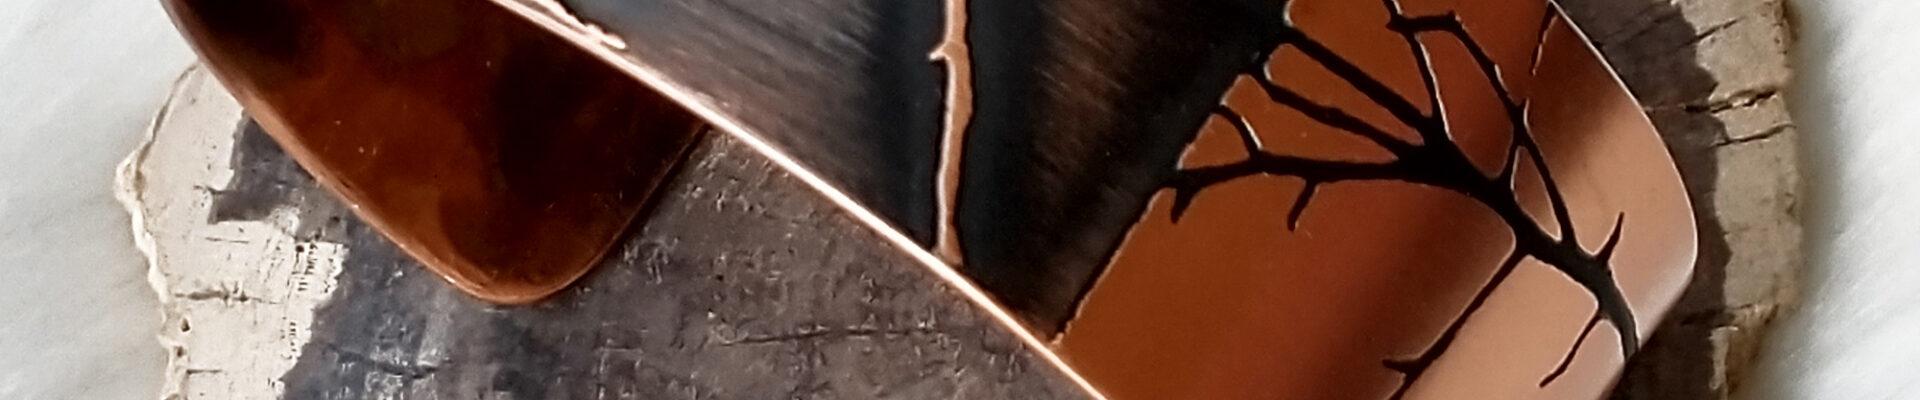 Asymmetric Tree, Copper Cuff, Handmade Bracelet